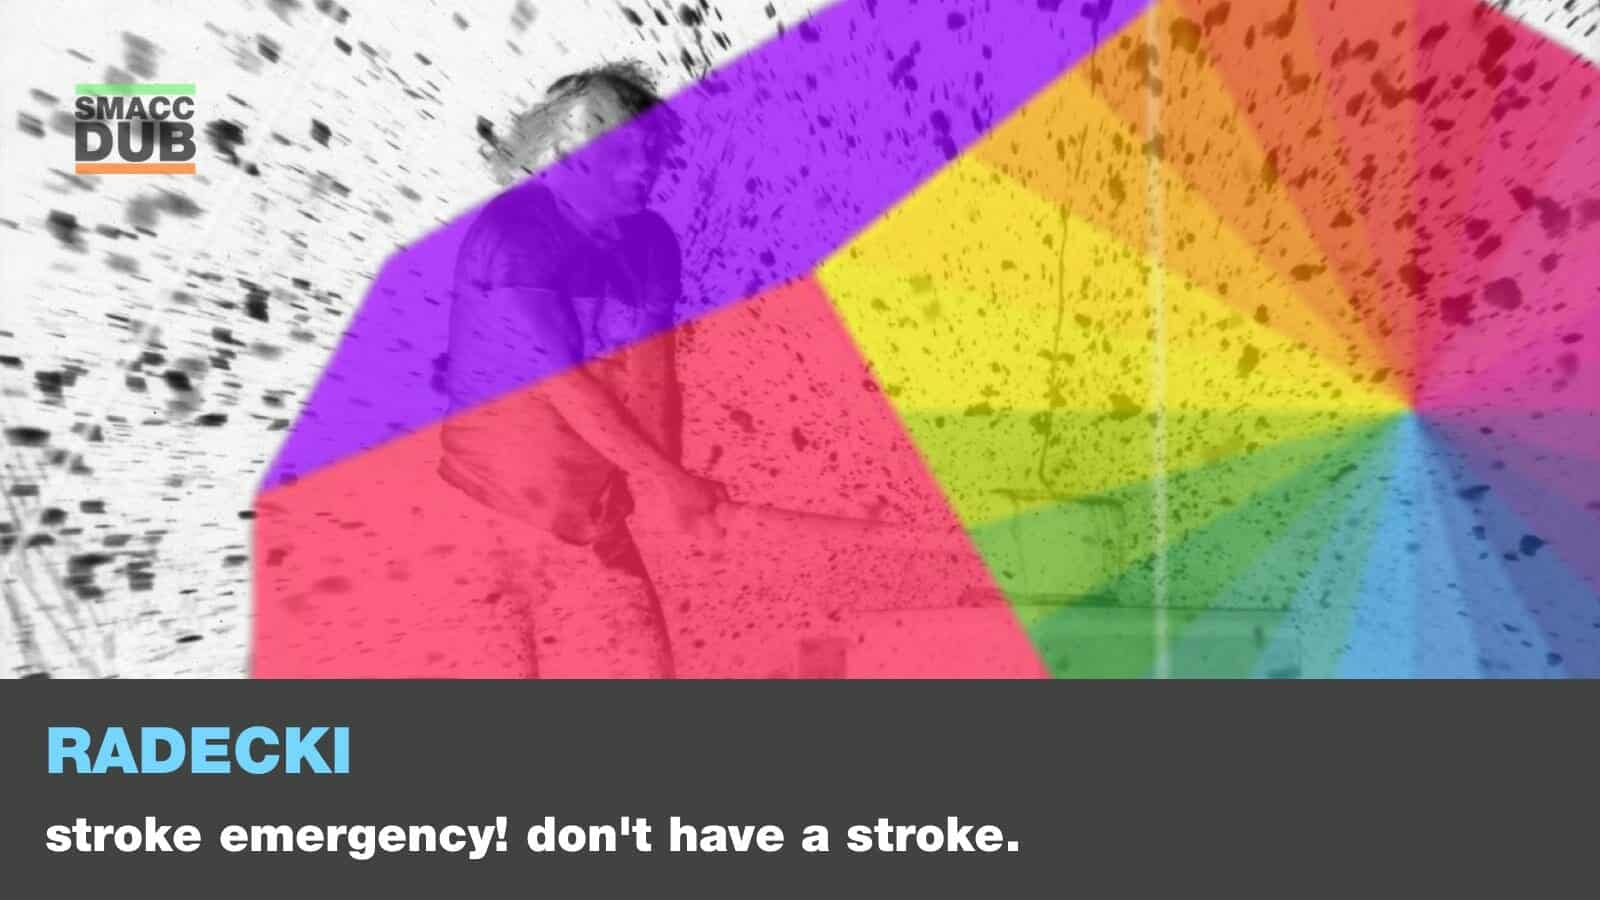 Radecki - Stroke emergency! don't have a stroke.